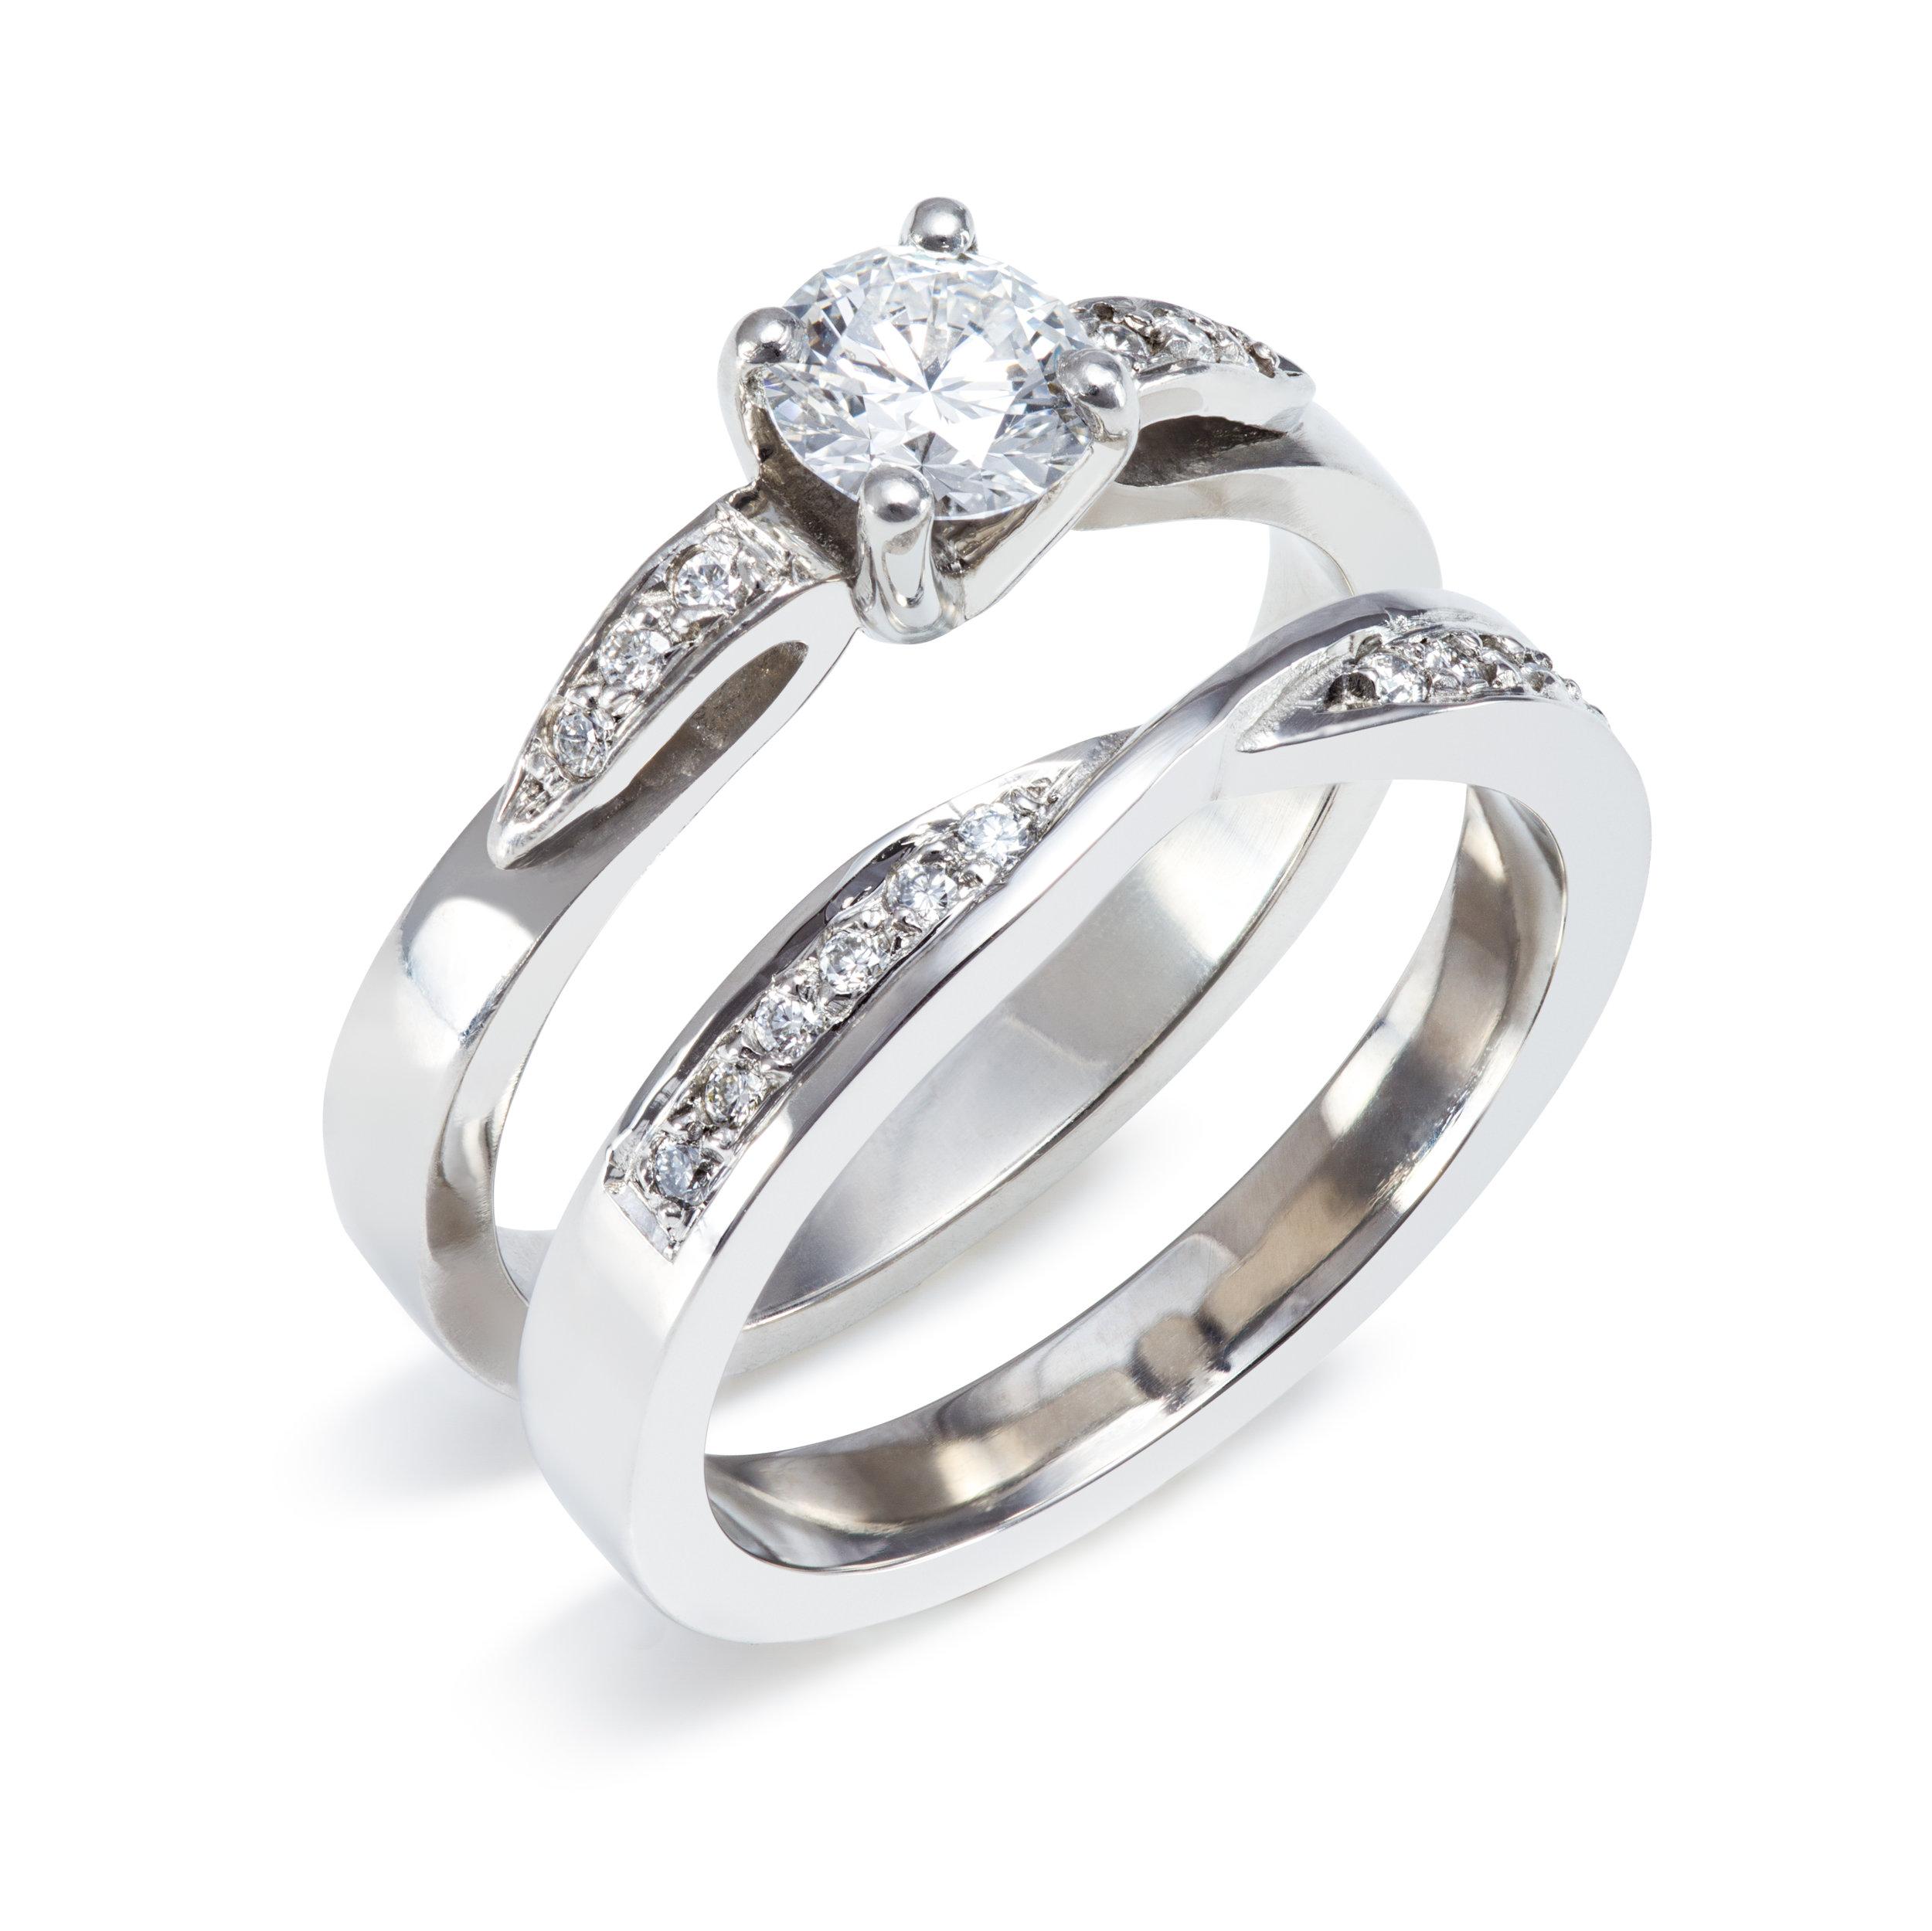 Bespoke platinum and diamond engagement and wedding ring commission